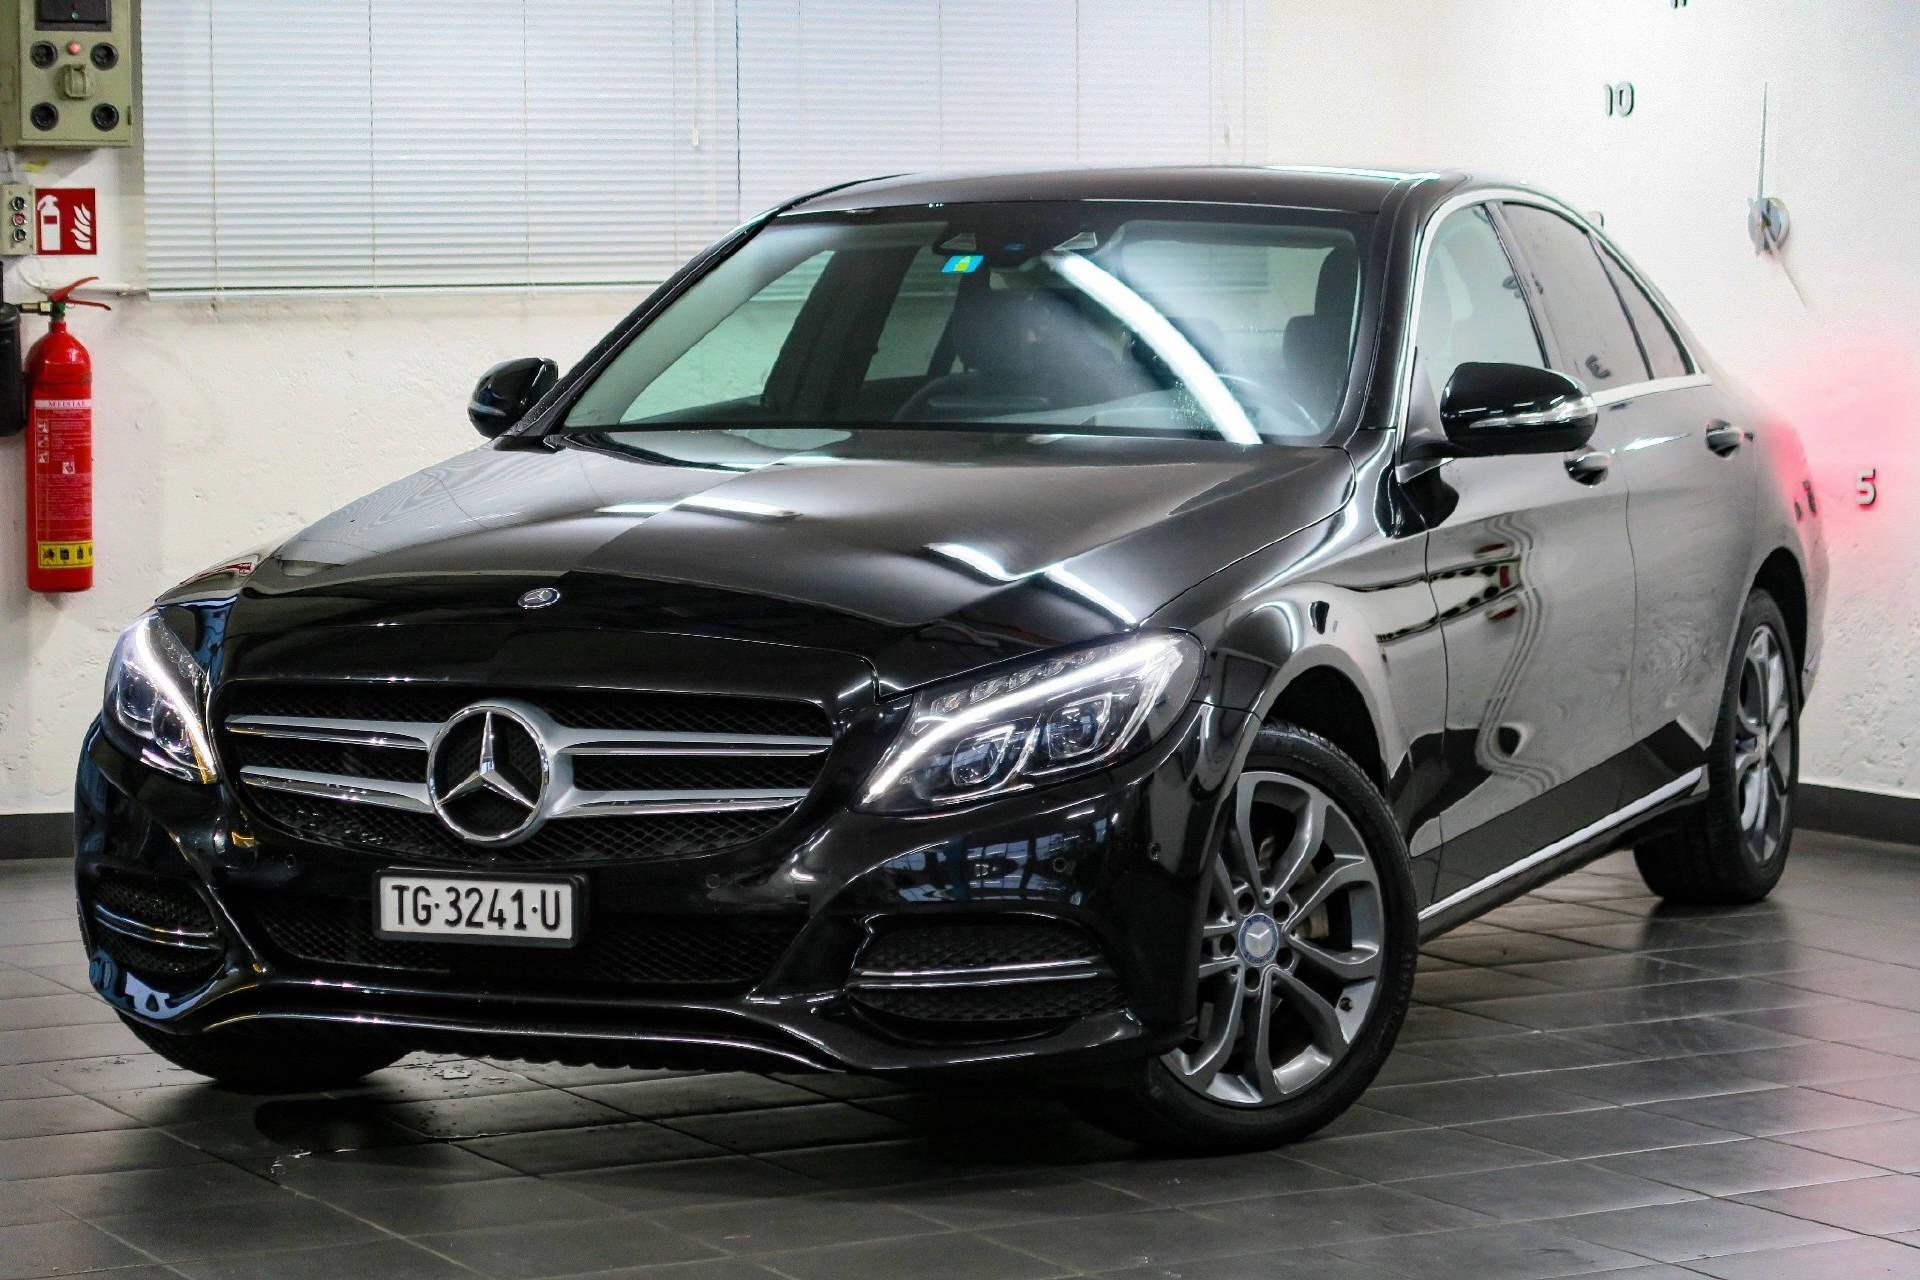 Buy Used Car Sedan Mercedes Benz C Klasse C 220 Bluetec Avantgarde 108500 Km At 22950 Chf On Carforyou Ch